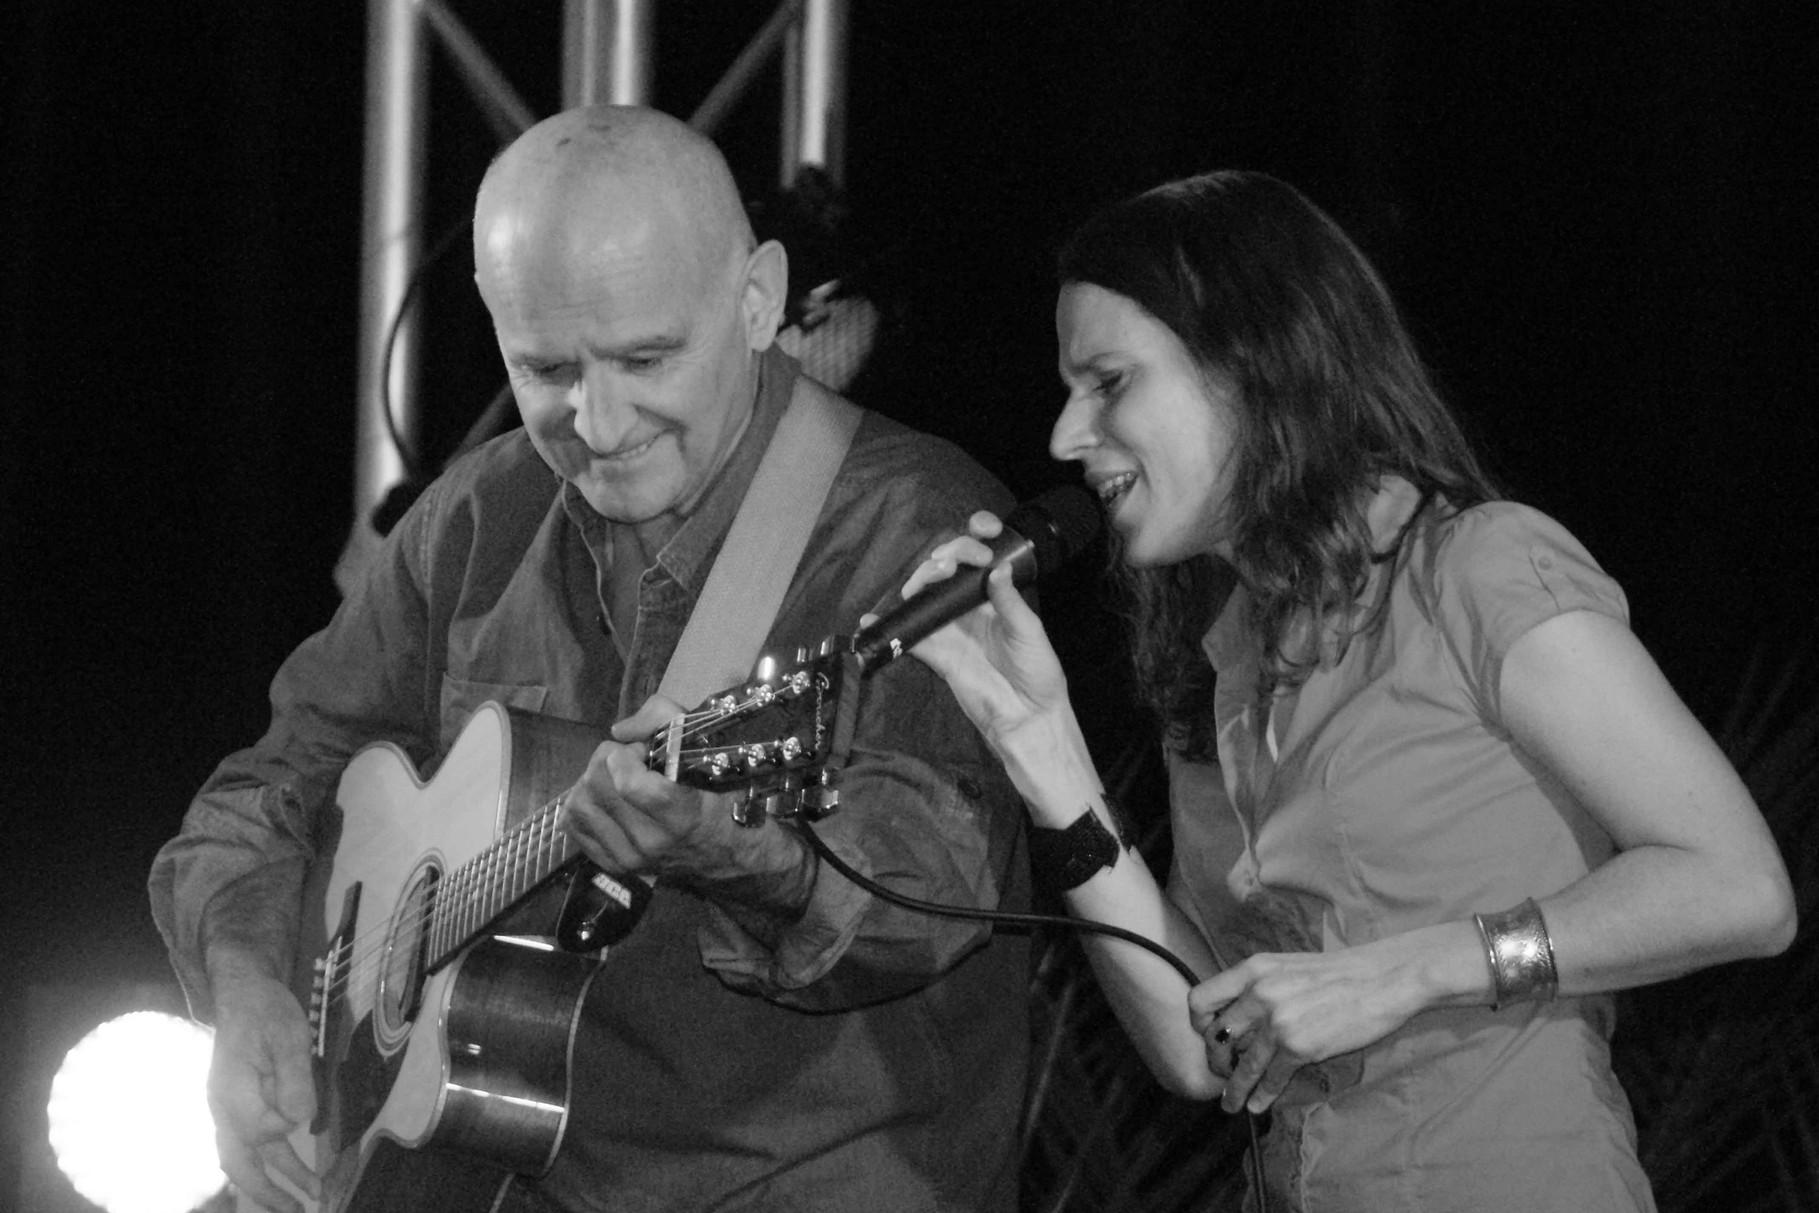 Dan Ar Braz et Clarisse Lavanant, concert de Ploézal